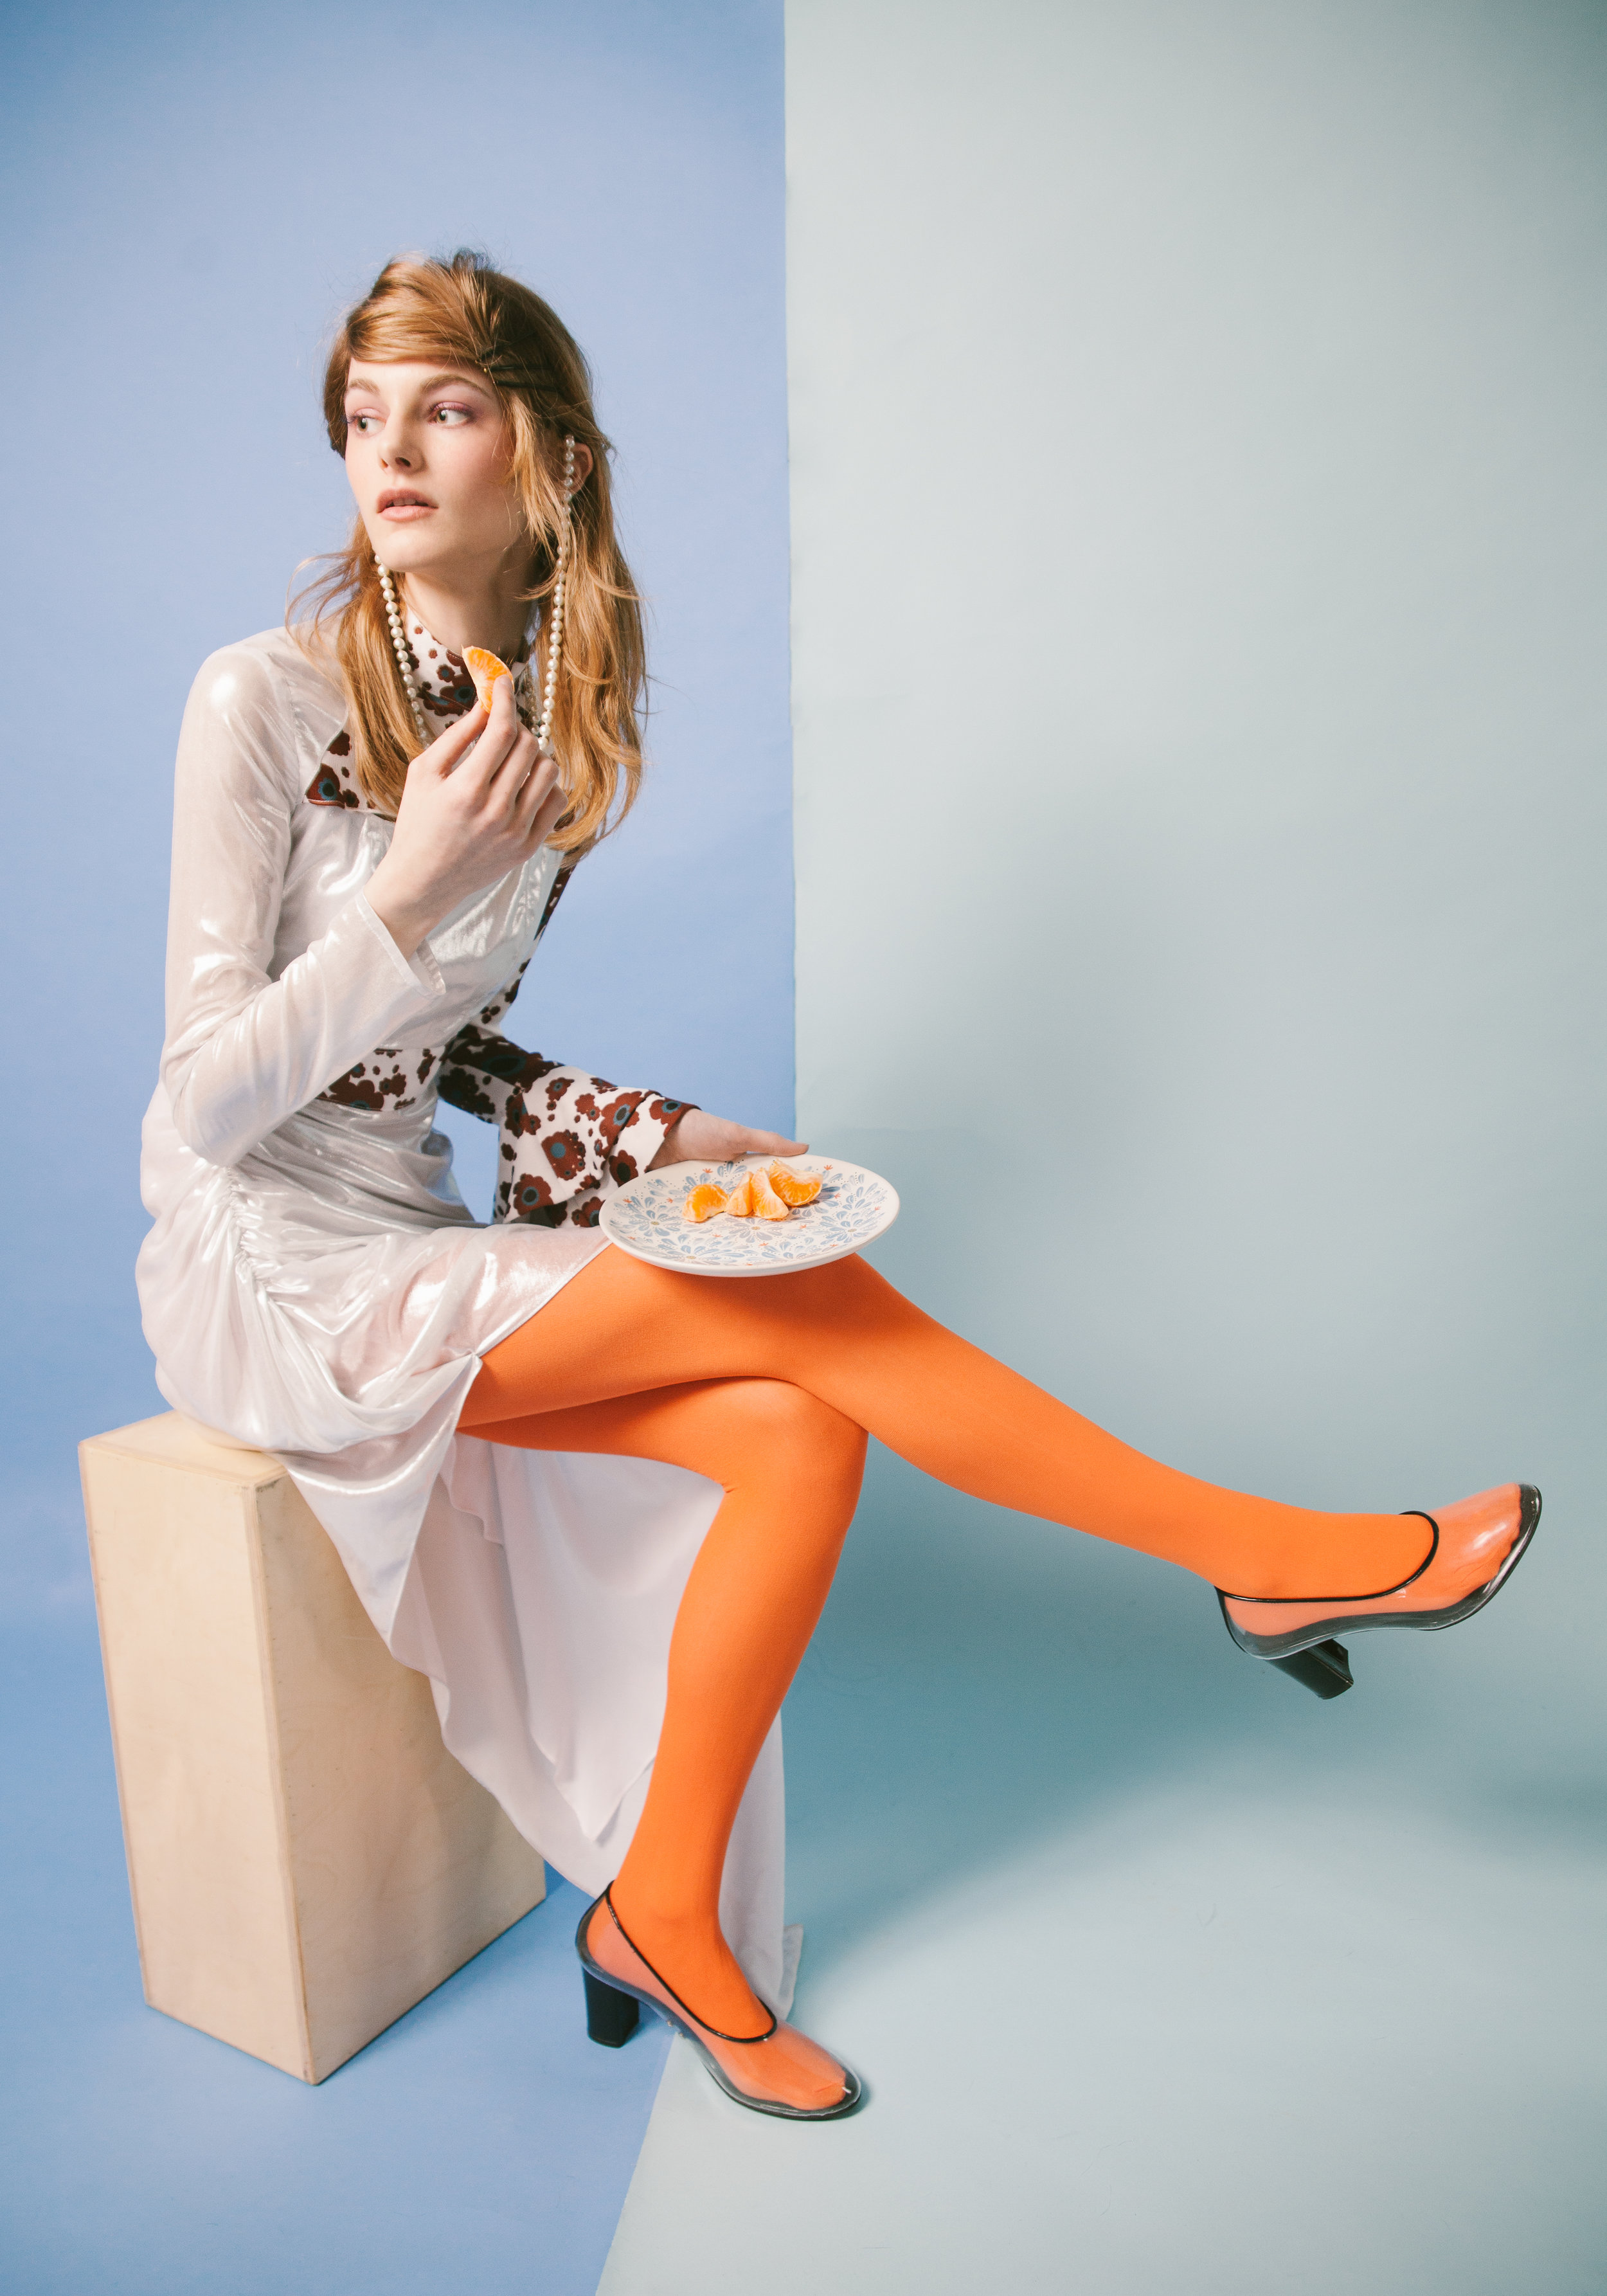 Dress Flou Flou. Shoes Z Tone